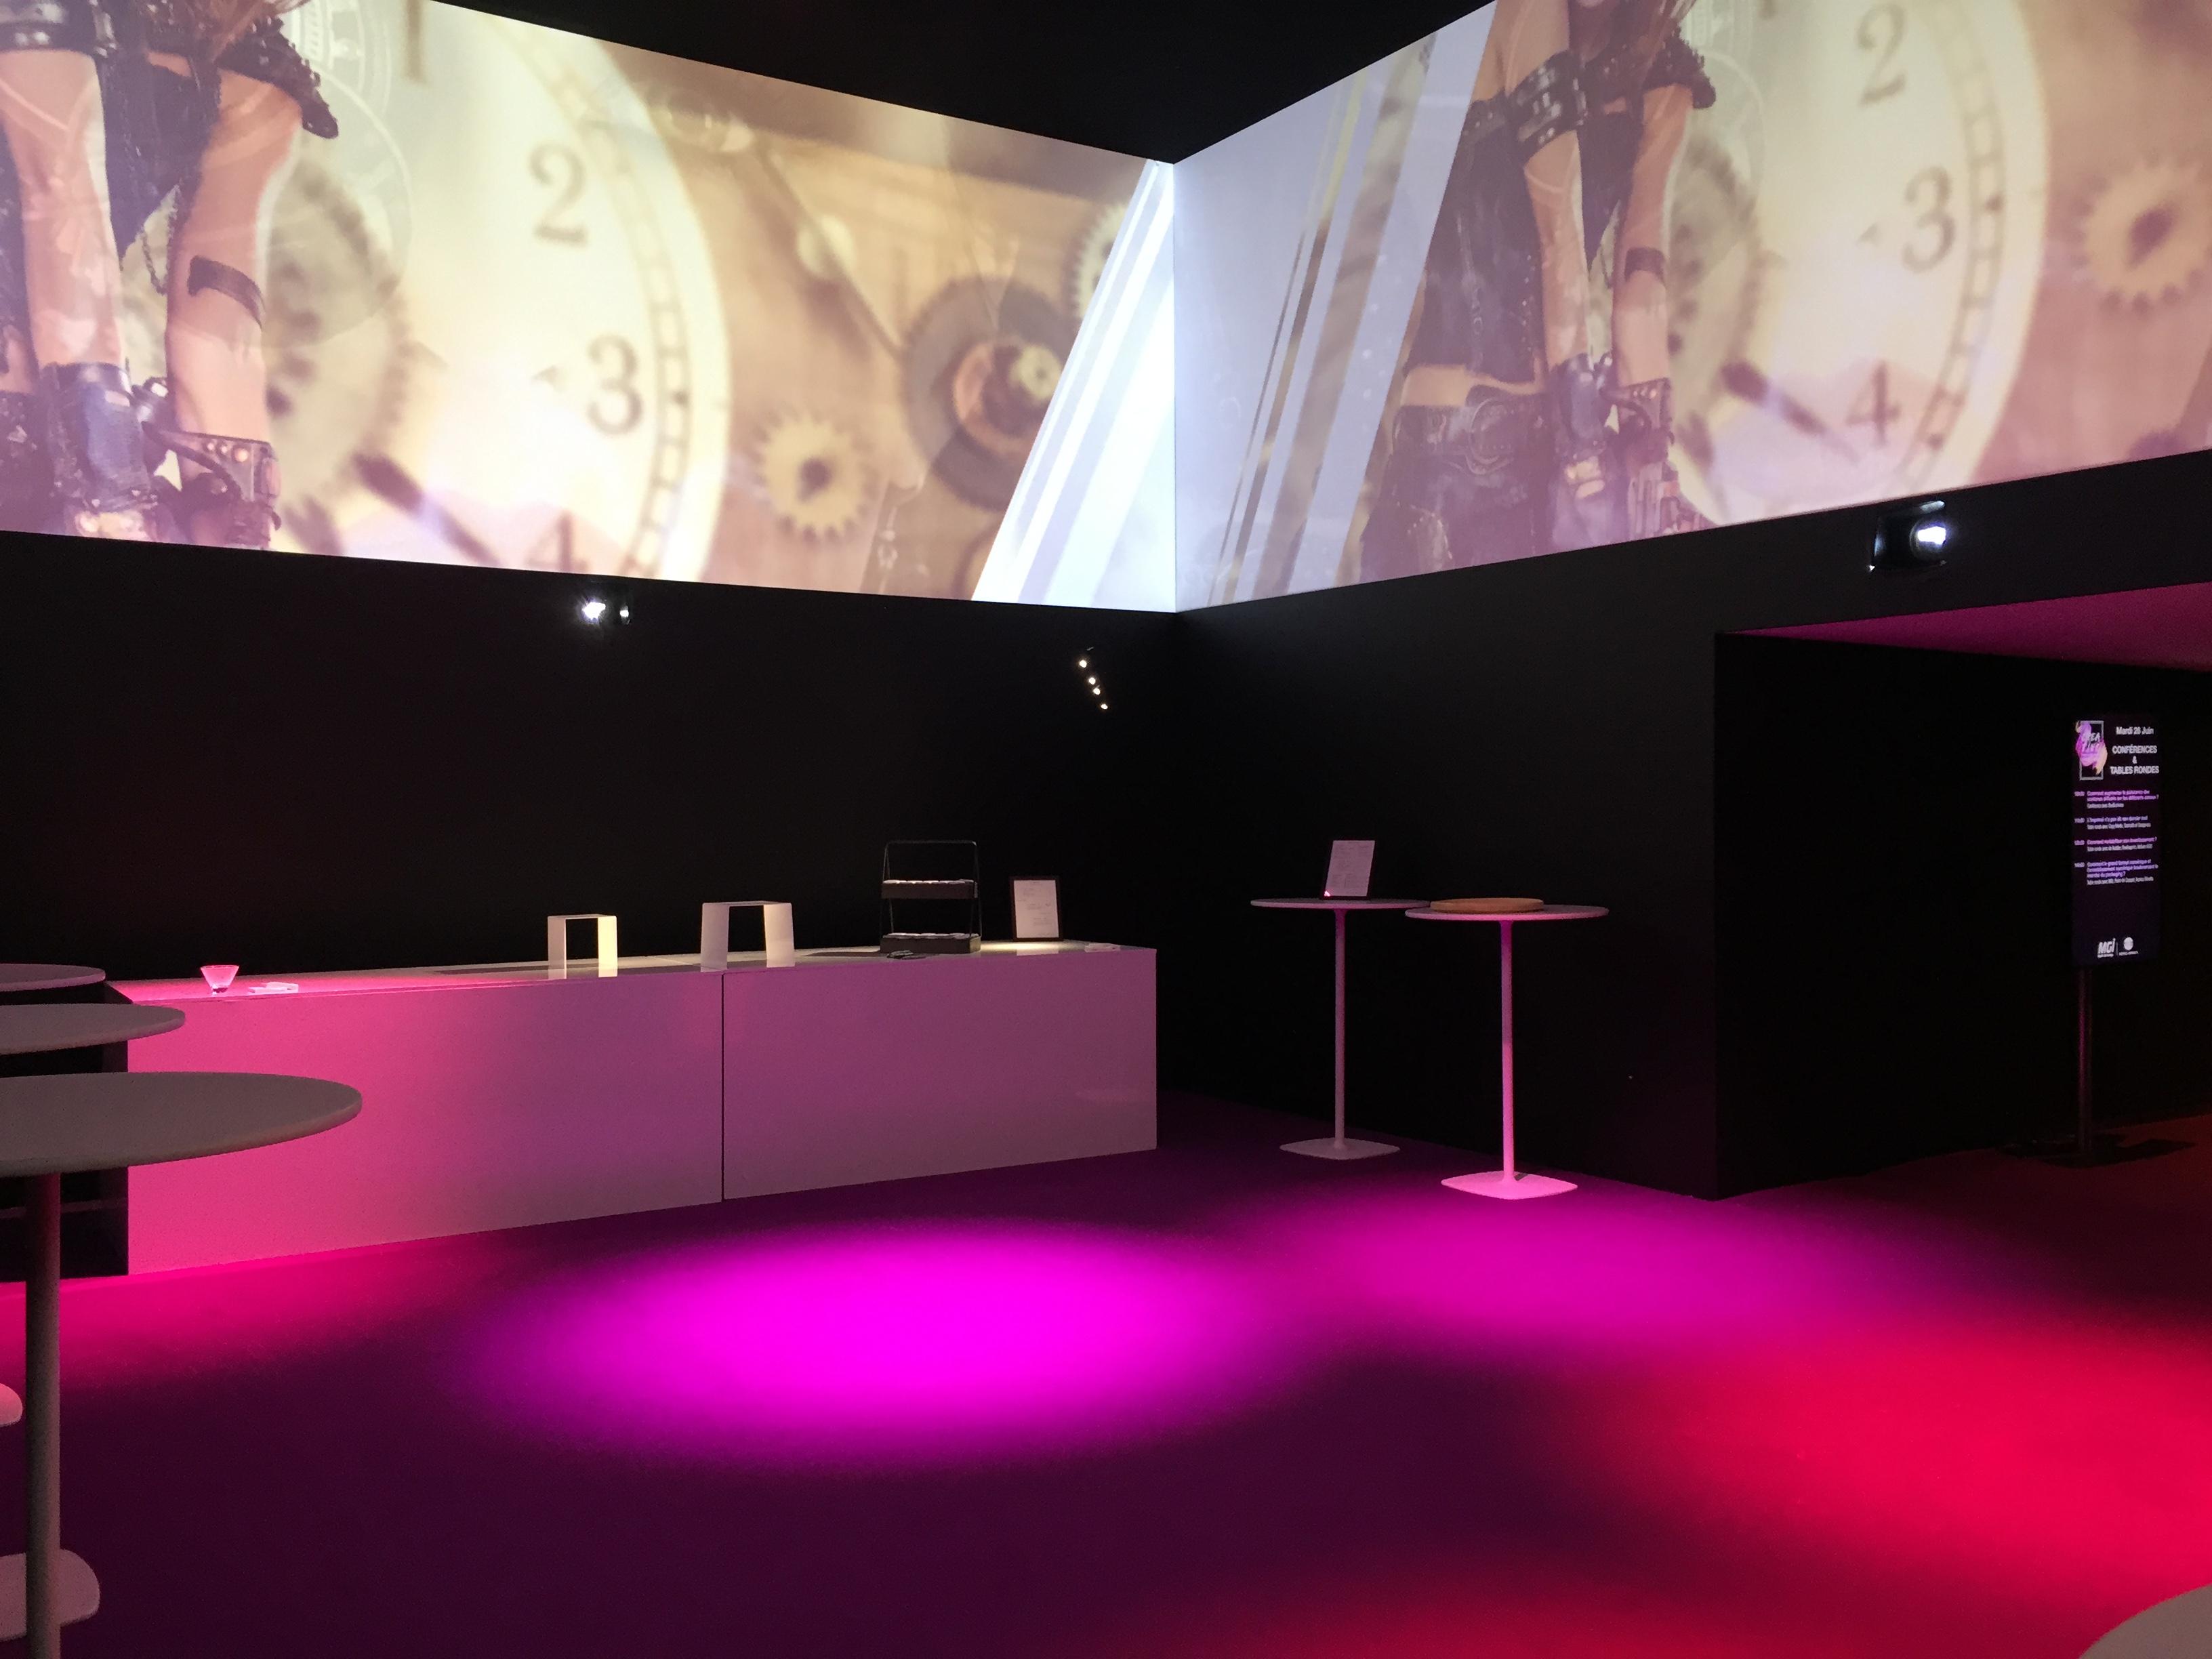 aucop-event-technique-audiovisuel-video-eclairage-sonorisation-deco-konica minolta-comsquare-projecteur-ecran 360